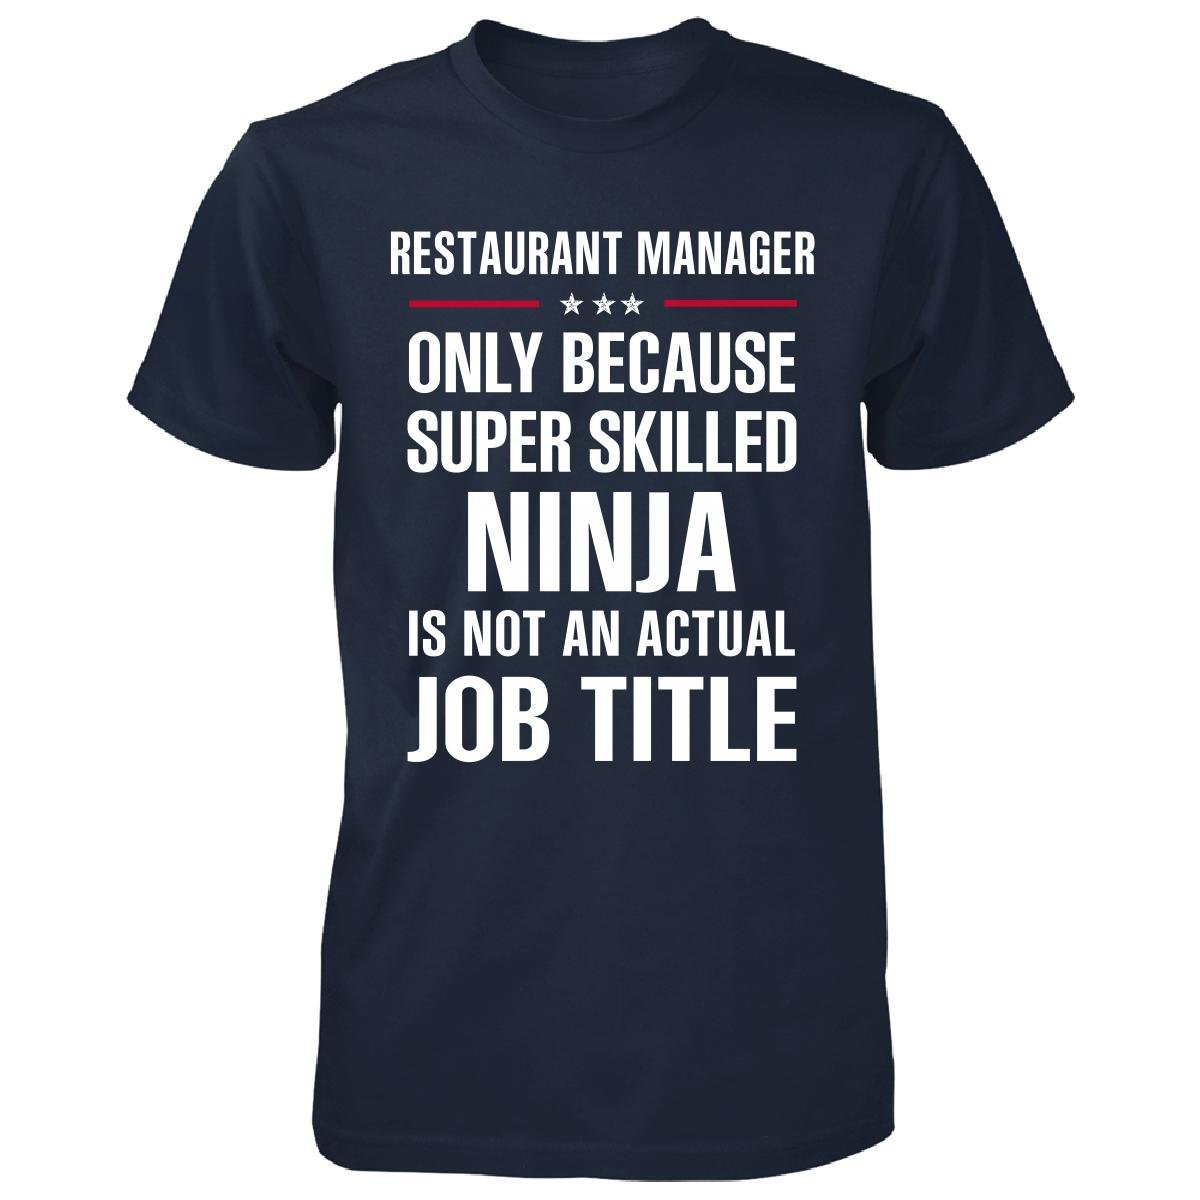 Amazon.com: Best Gift For A Super Skilled Ninja Restaurant ...